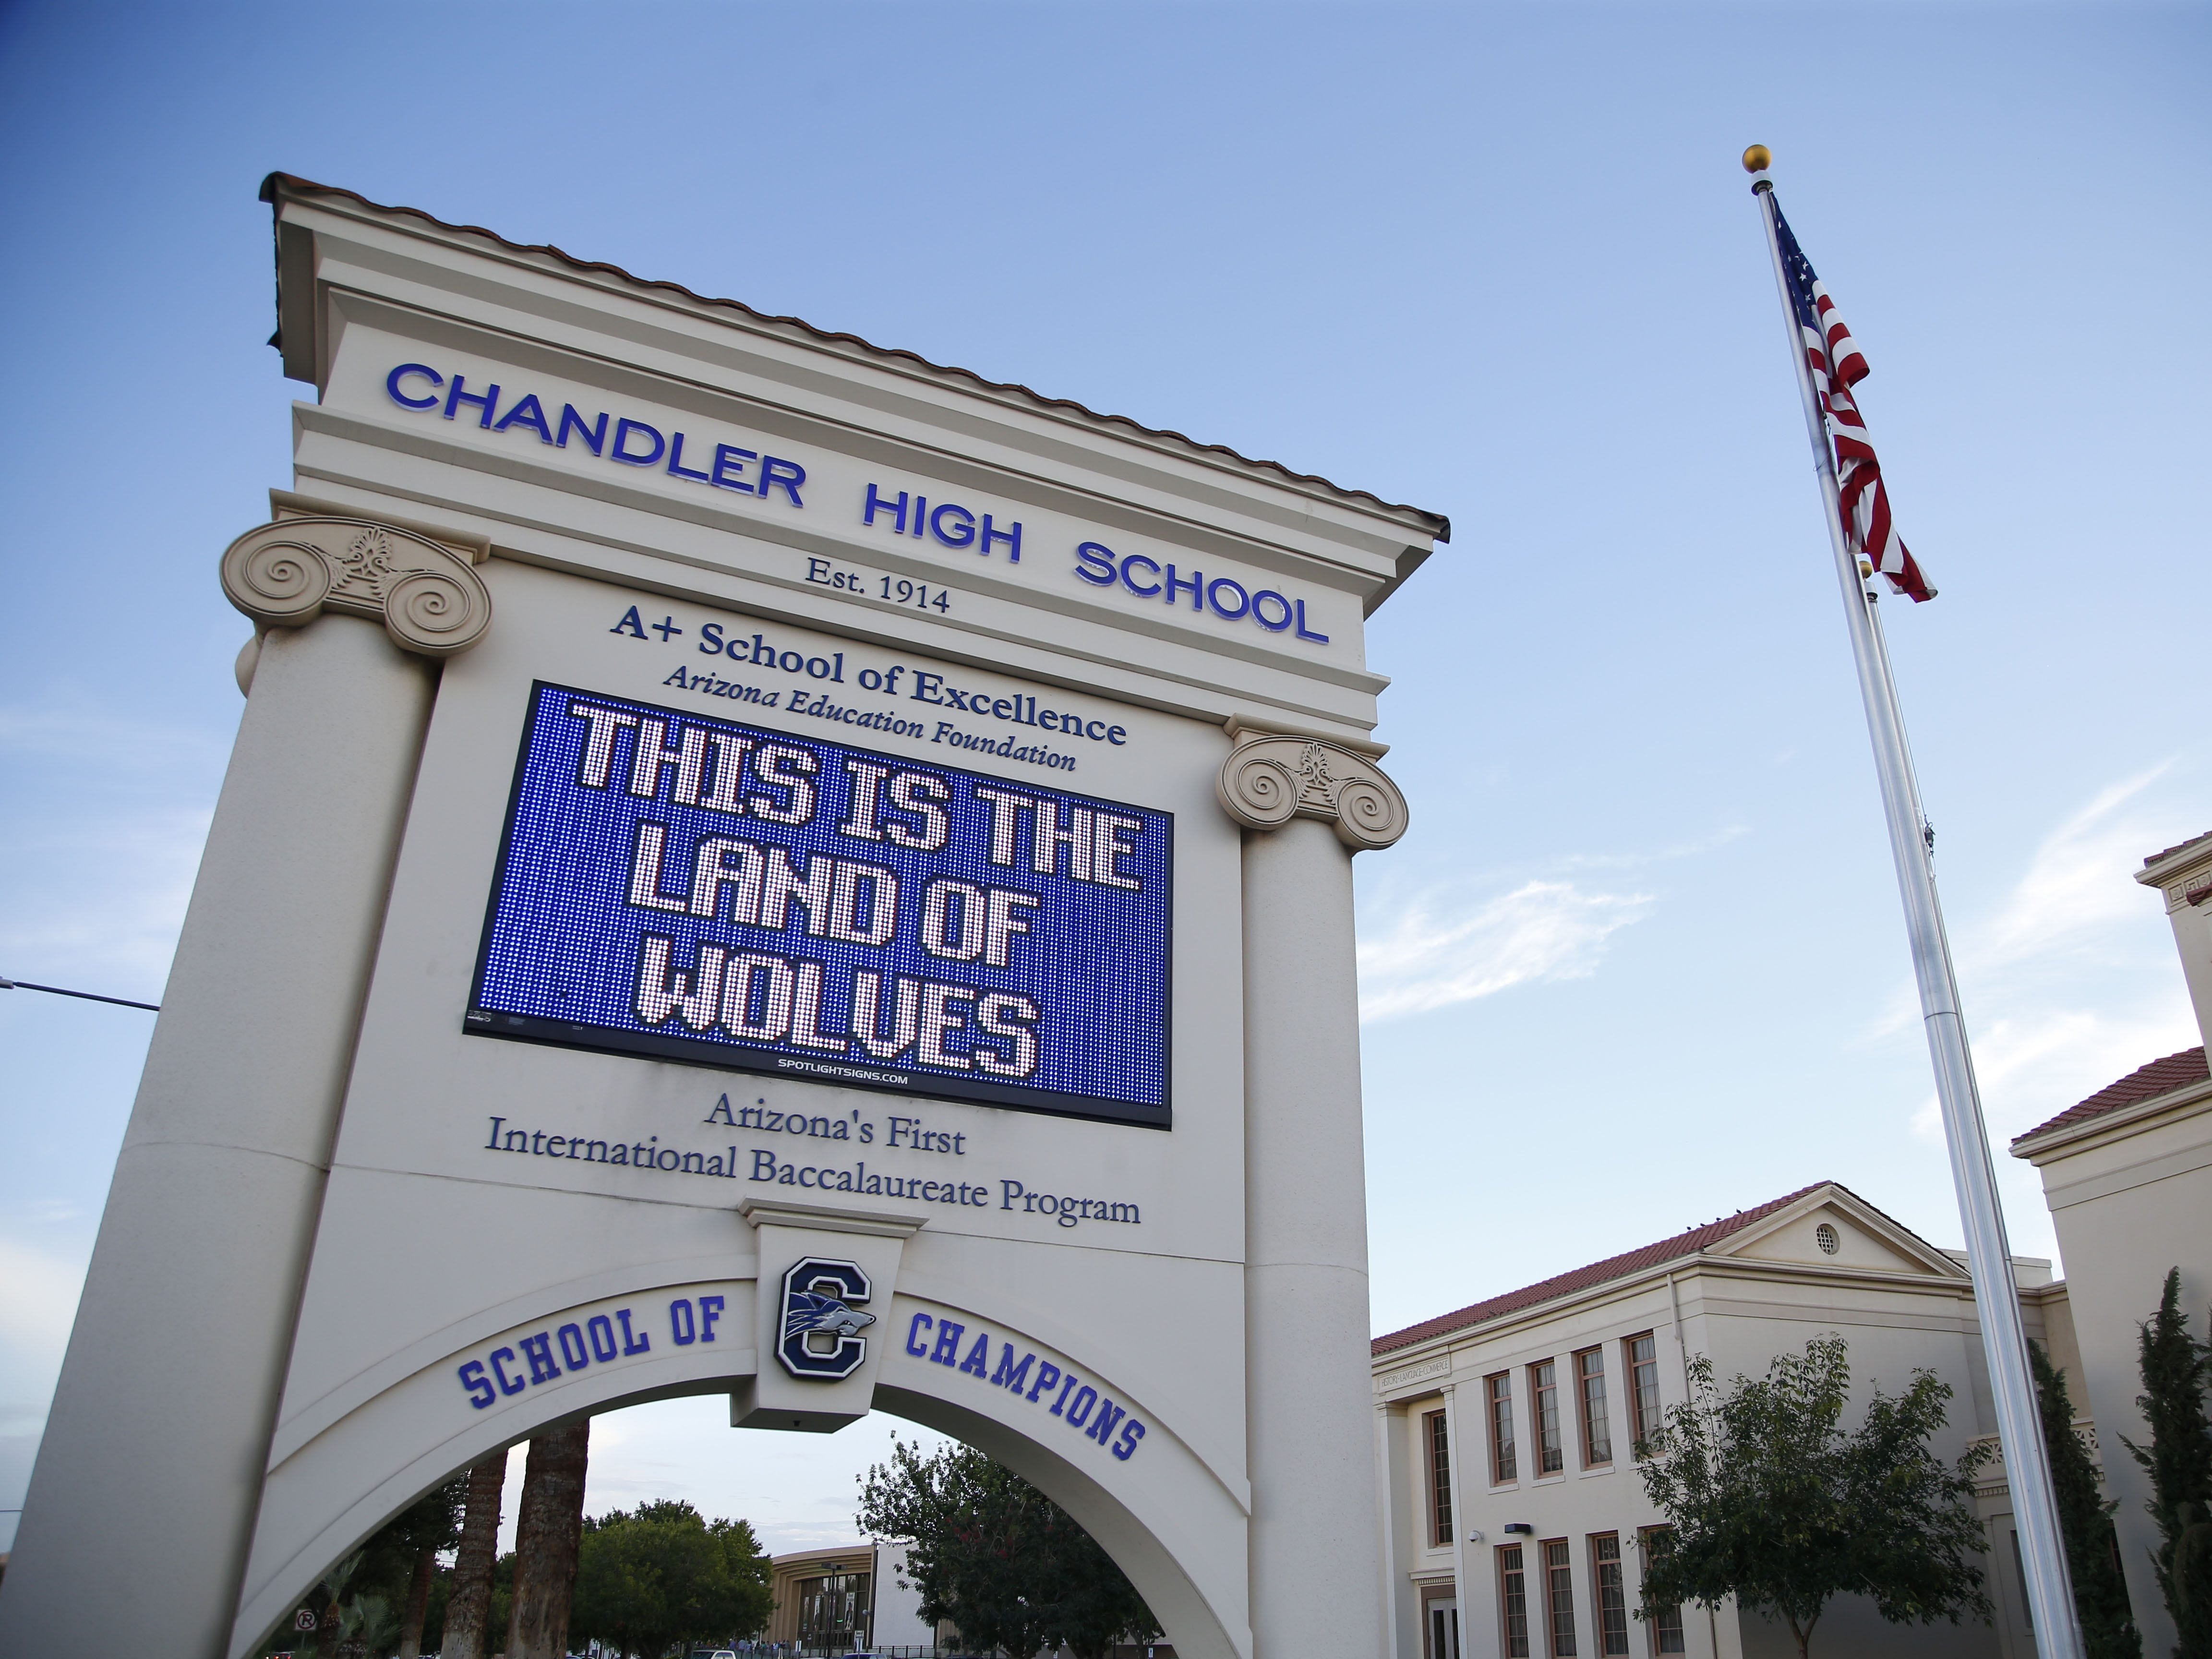 Chandler High school's marquee on August 24, 2018. #azhsfb